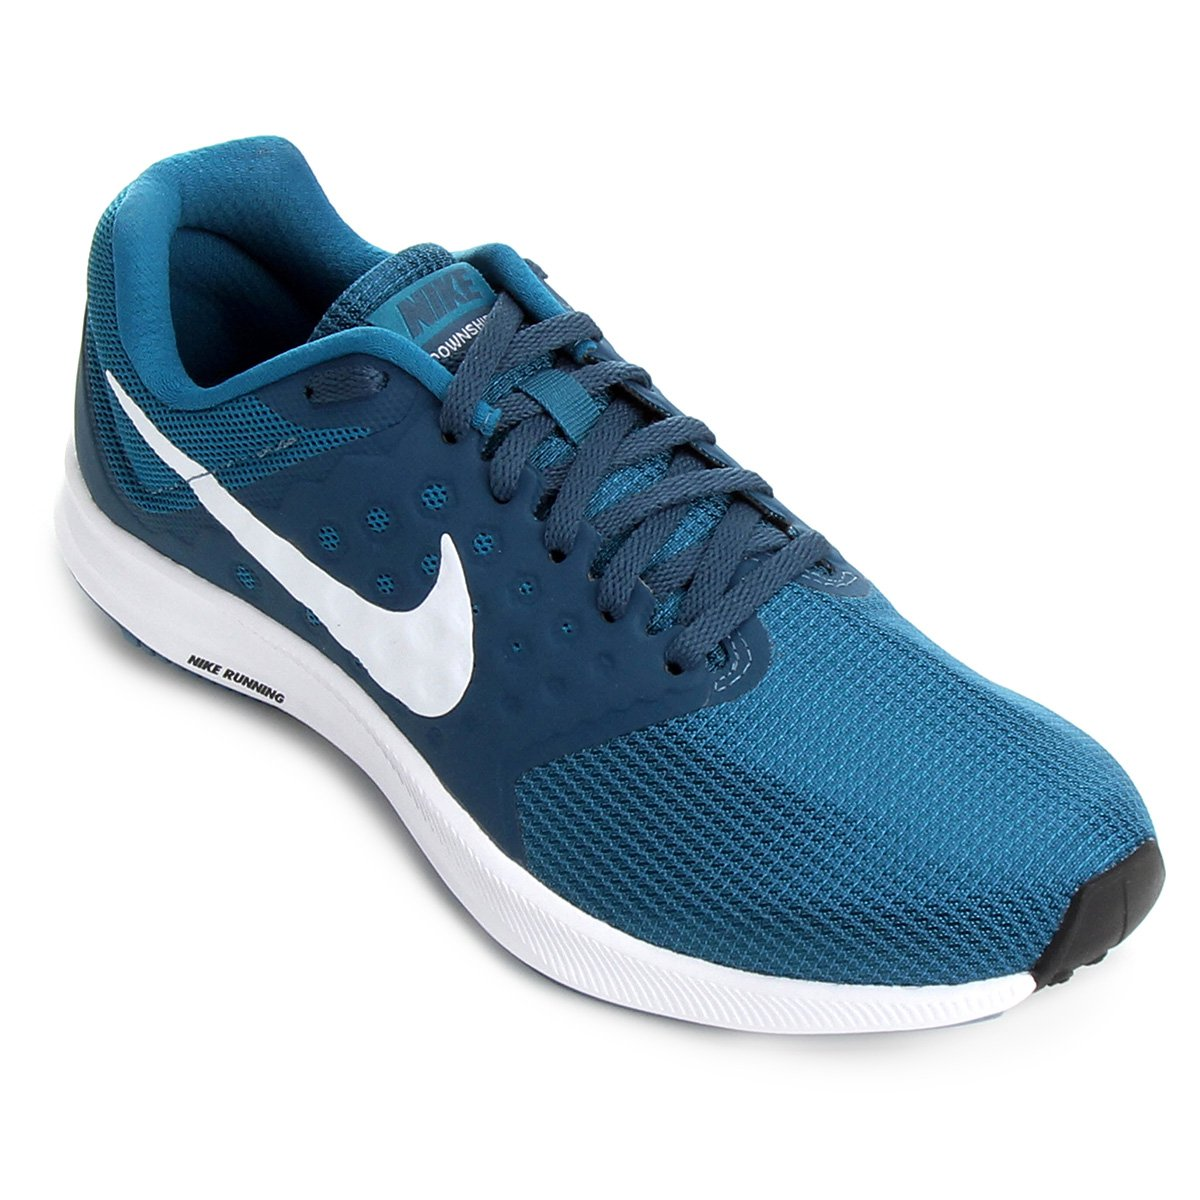 409dc21094 Tênis Nike Downshifter 7 Masculino - Compre Agora